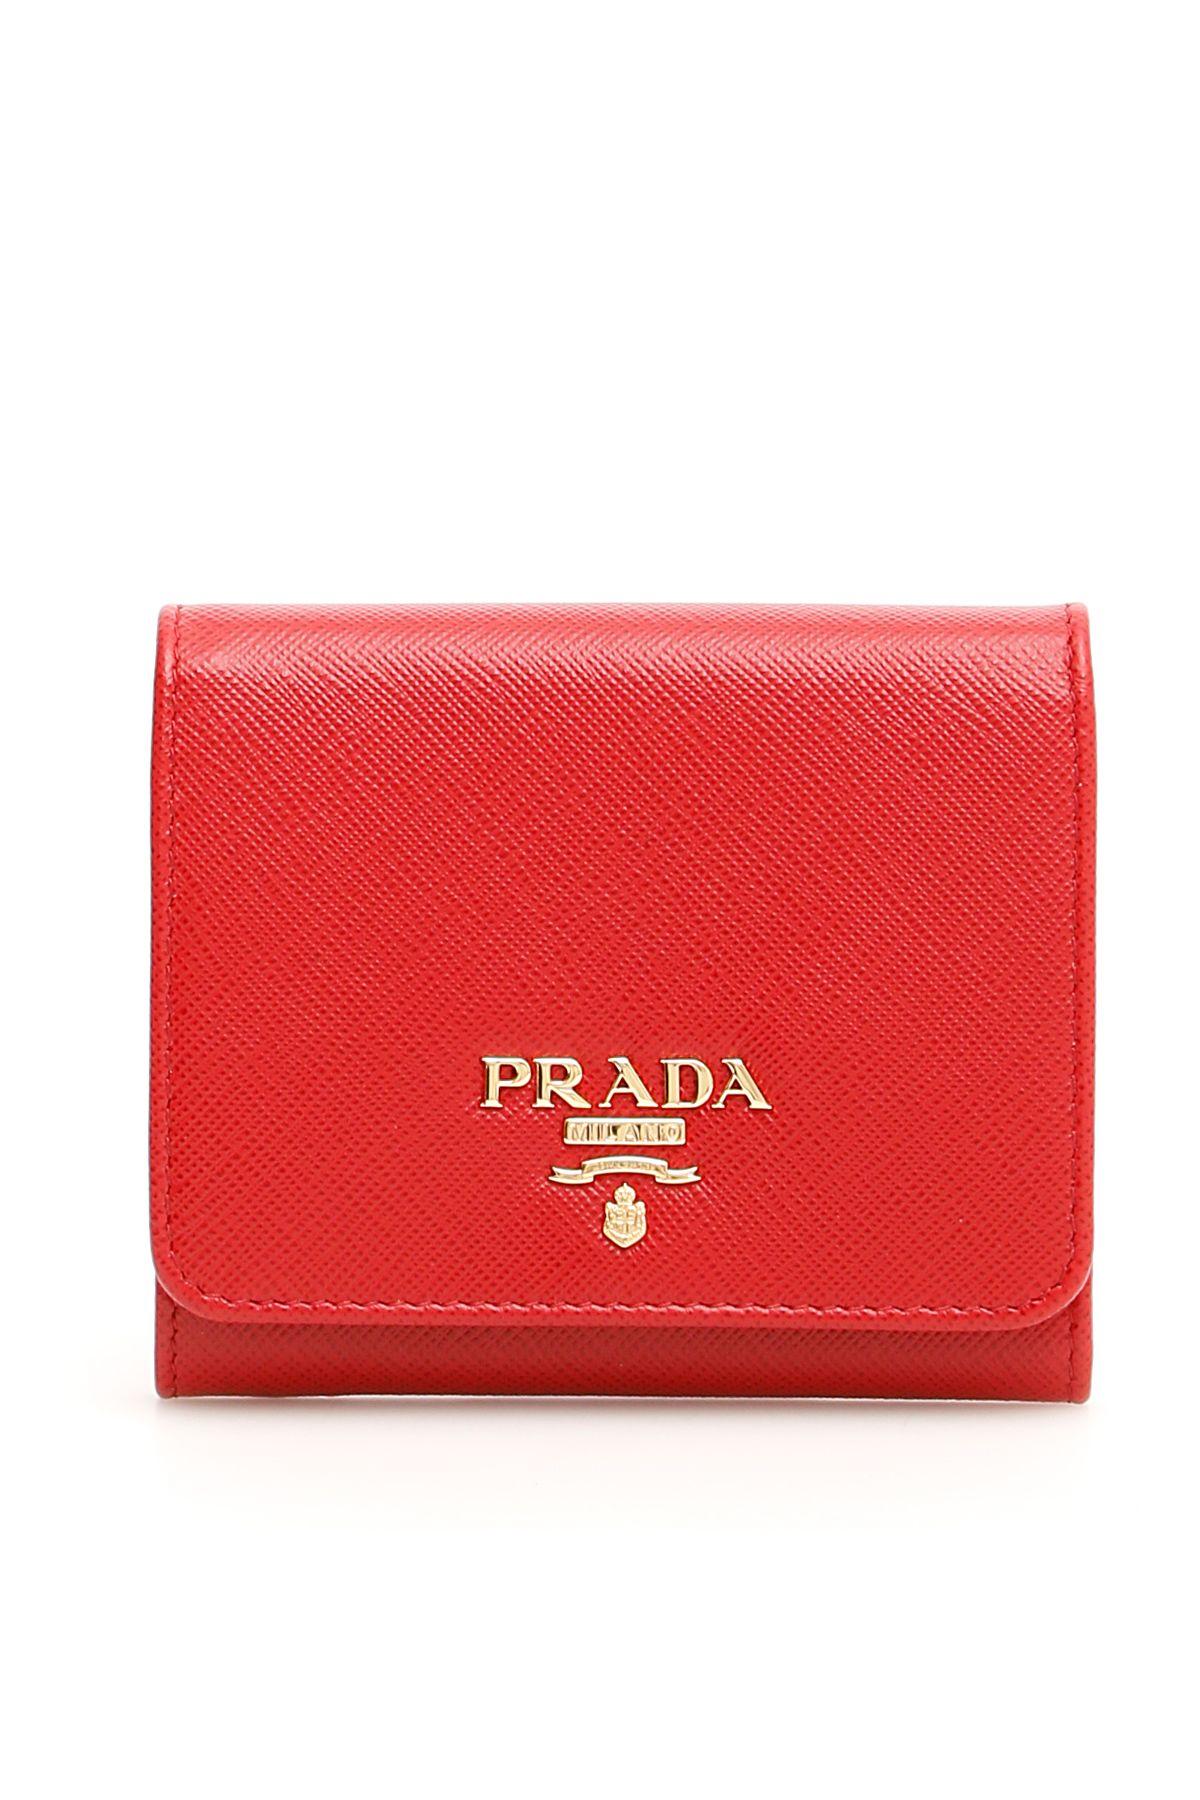 2be55362ccf7 Prada Prada Flap Wallet - Basic - 10784909